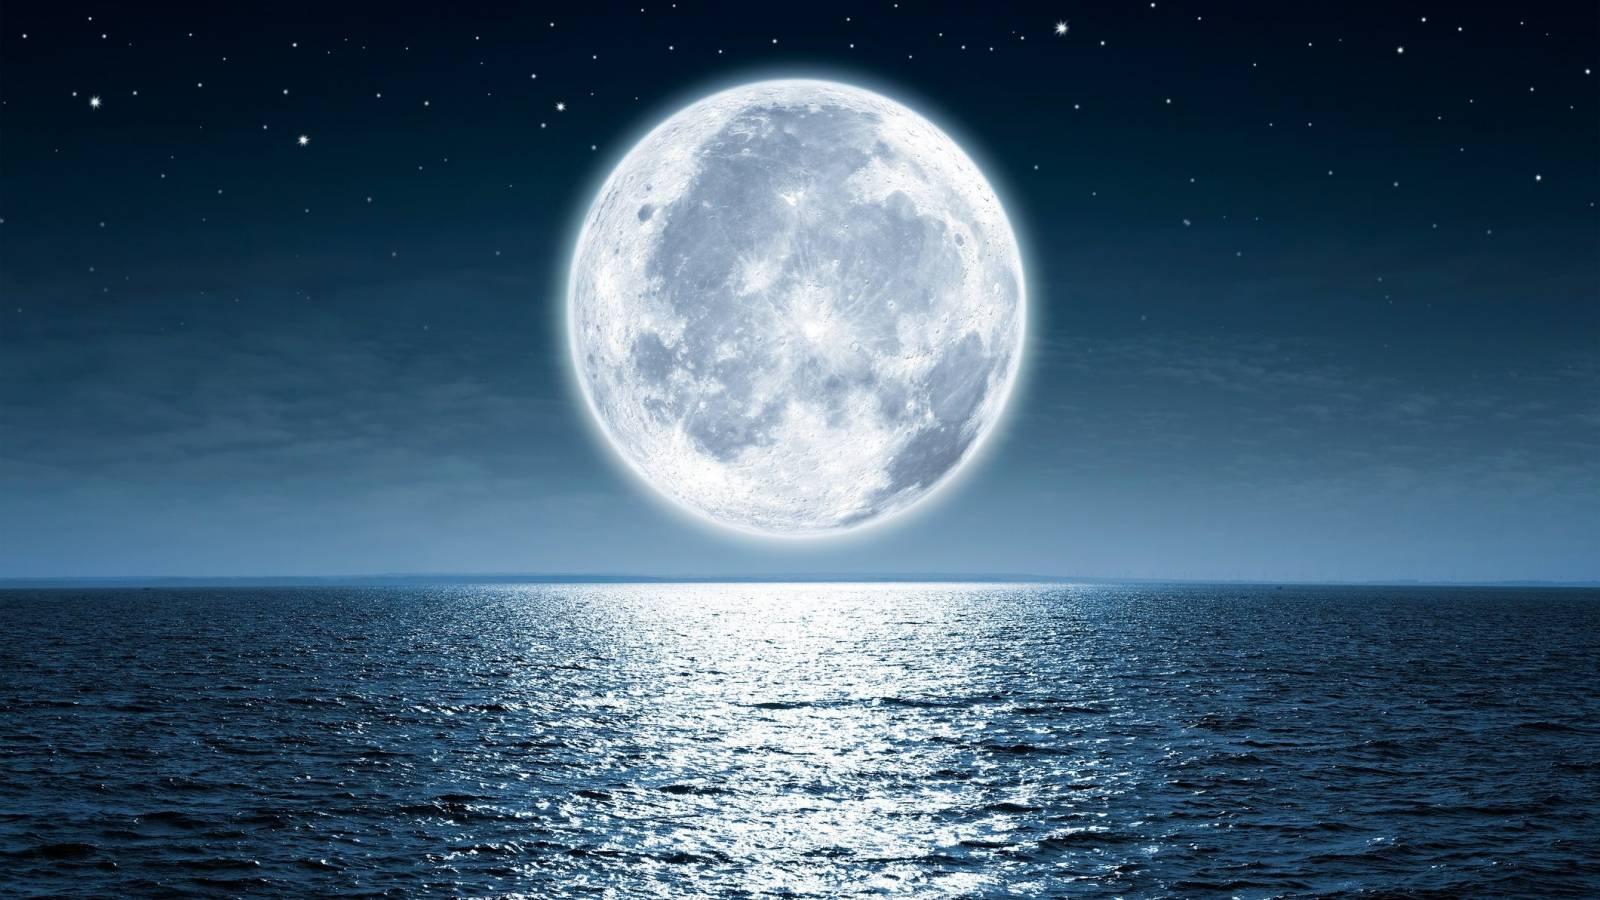 luna dubla